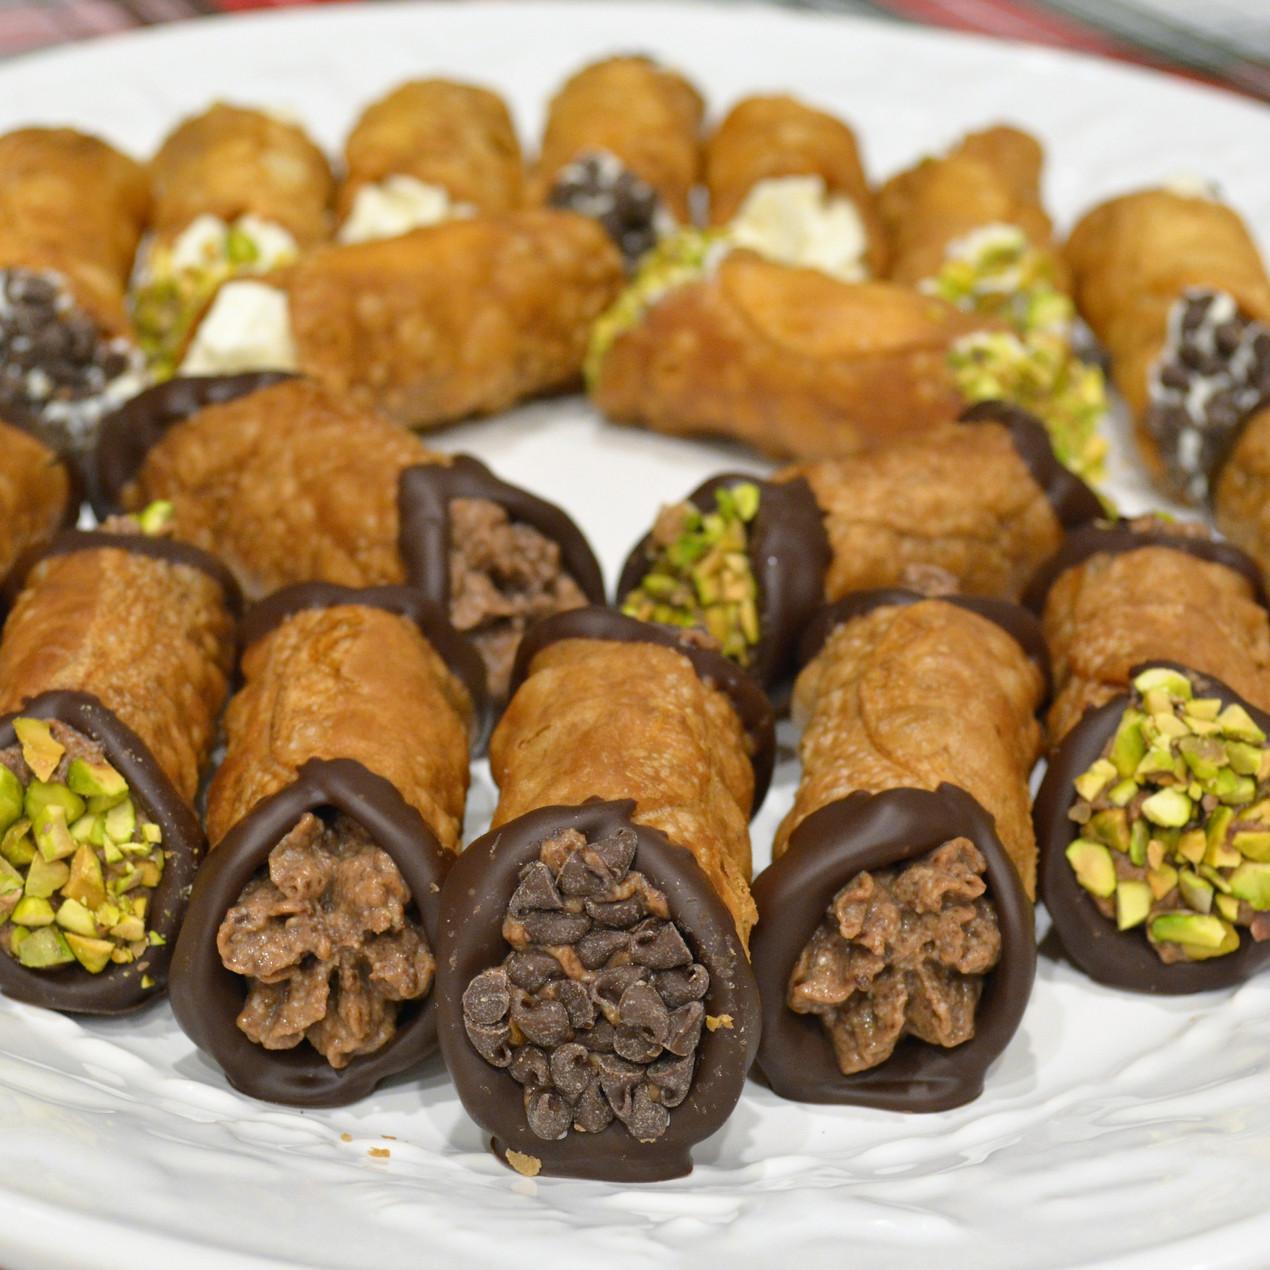 Homemade Italian Cannolis with Chocolate Ricotta Filling